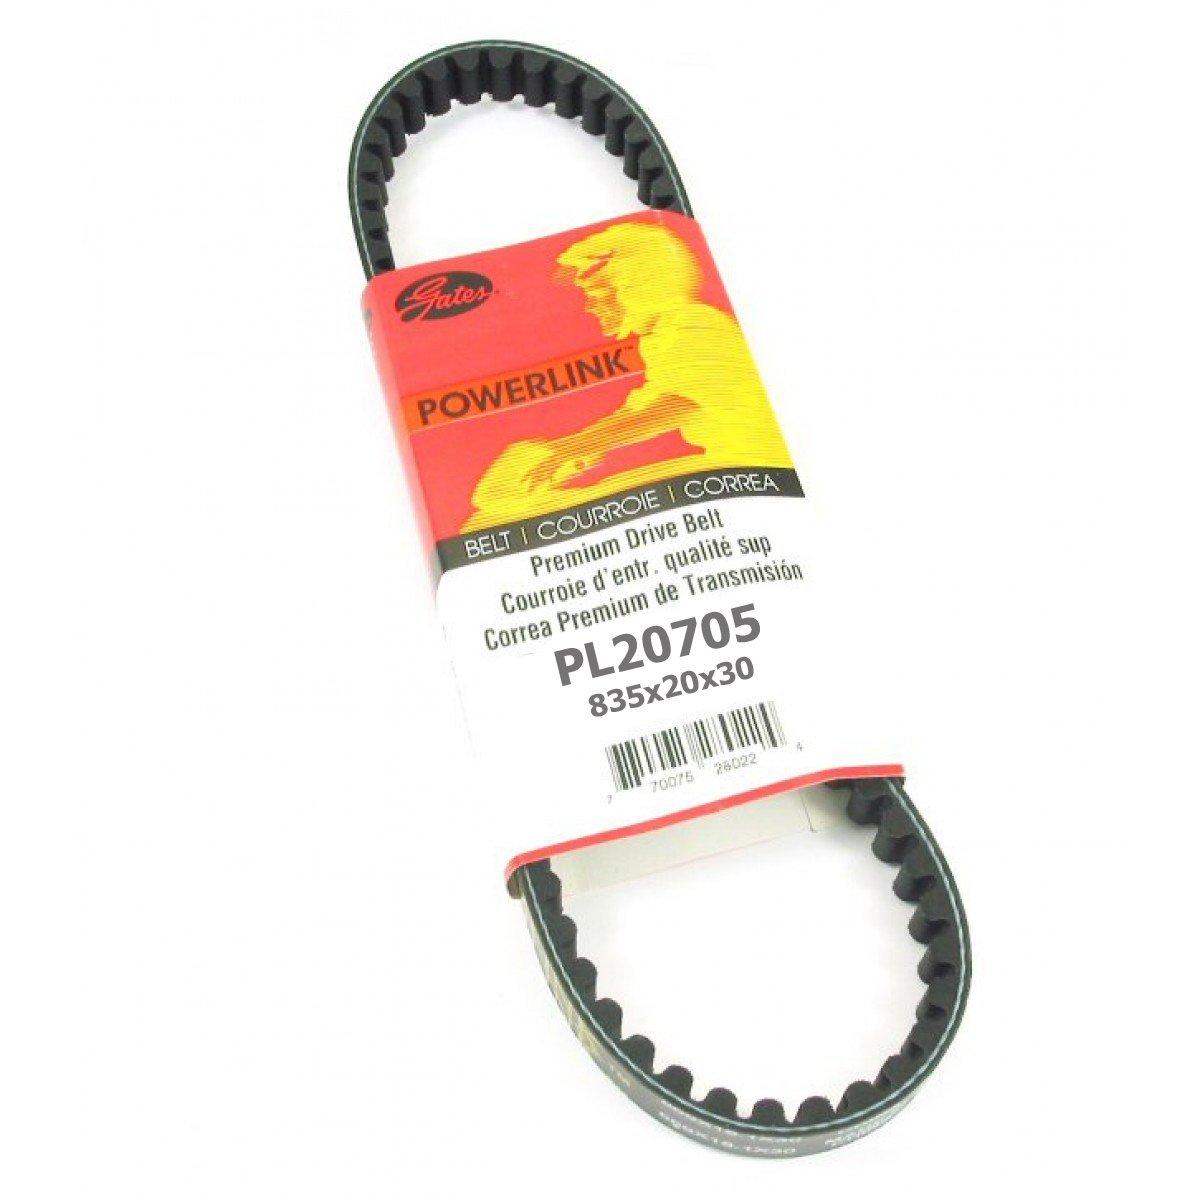 Premium Gates Powerlink PL20705 replaces 835 20 30 Standard CVT Drive Belt MMG MGVG835